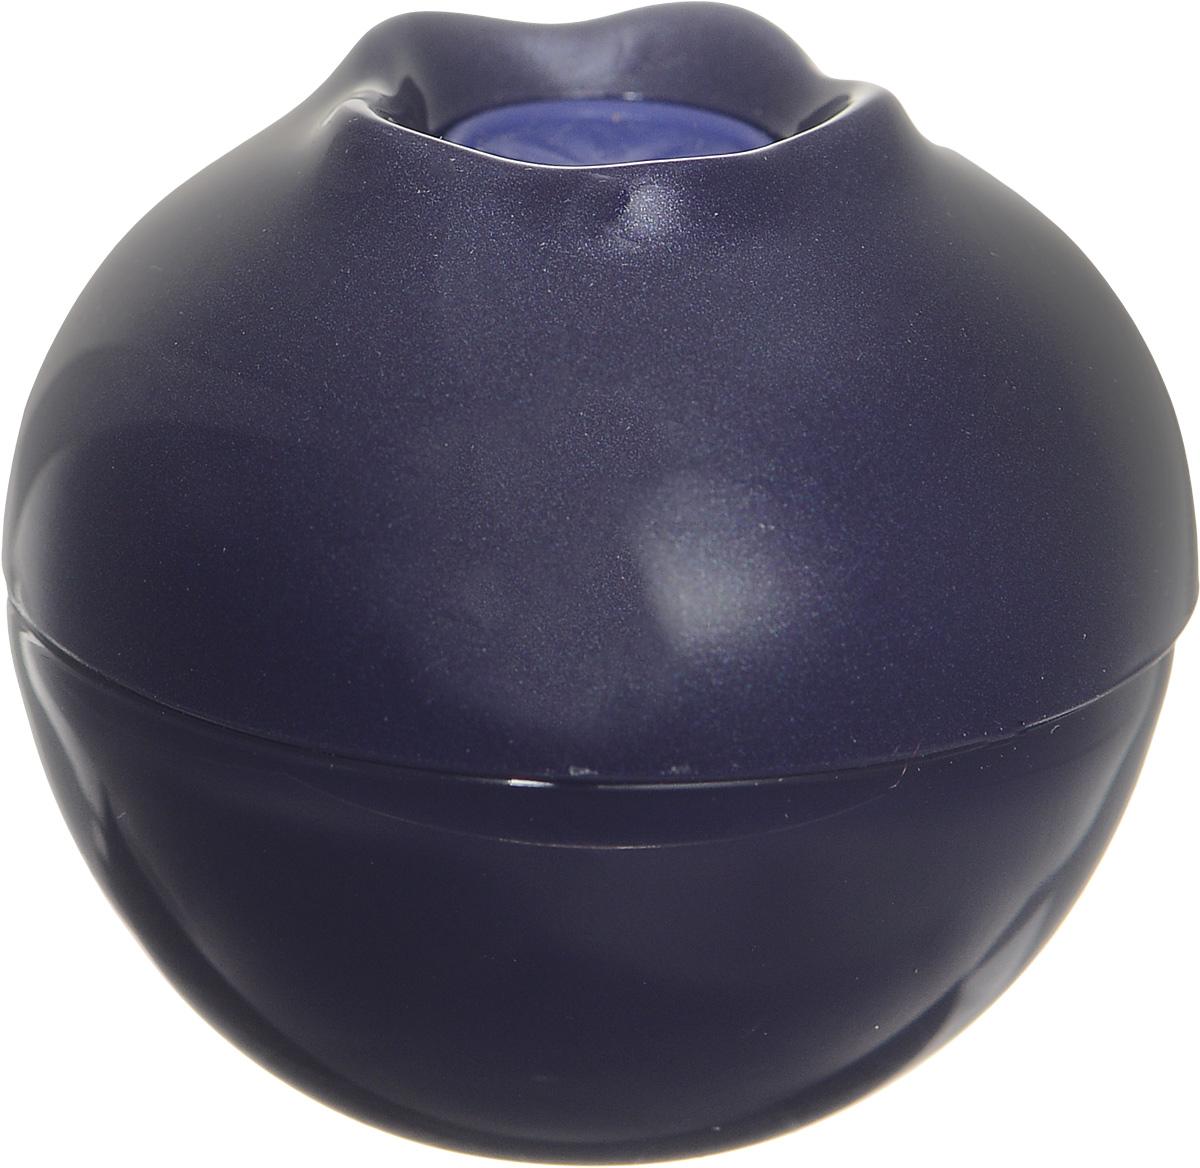 TonyMoly Бальзам для губ Mini Berry LIP Balm 02 BLUEBERRY черника, 7,2 гр